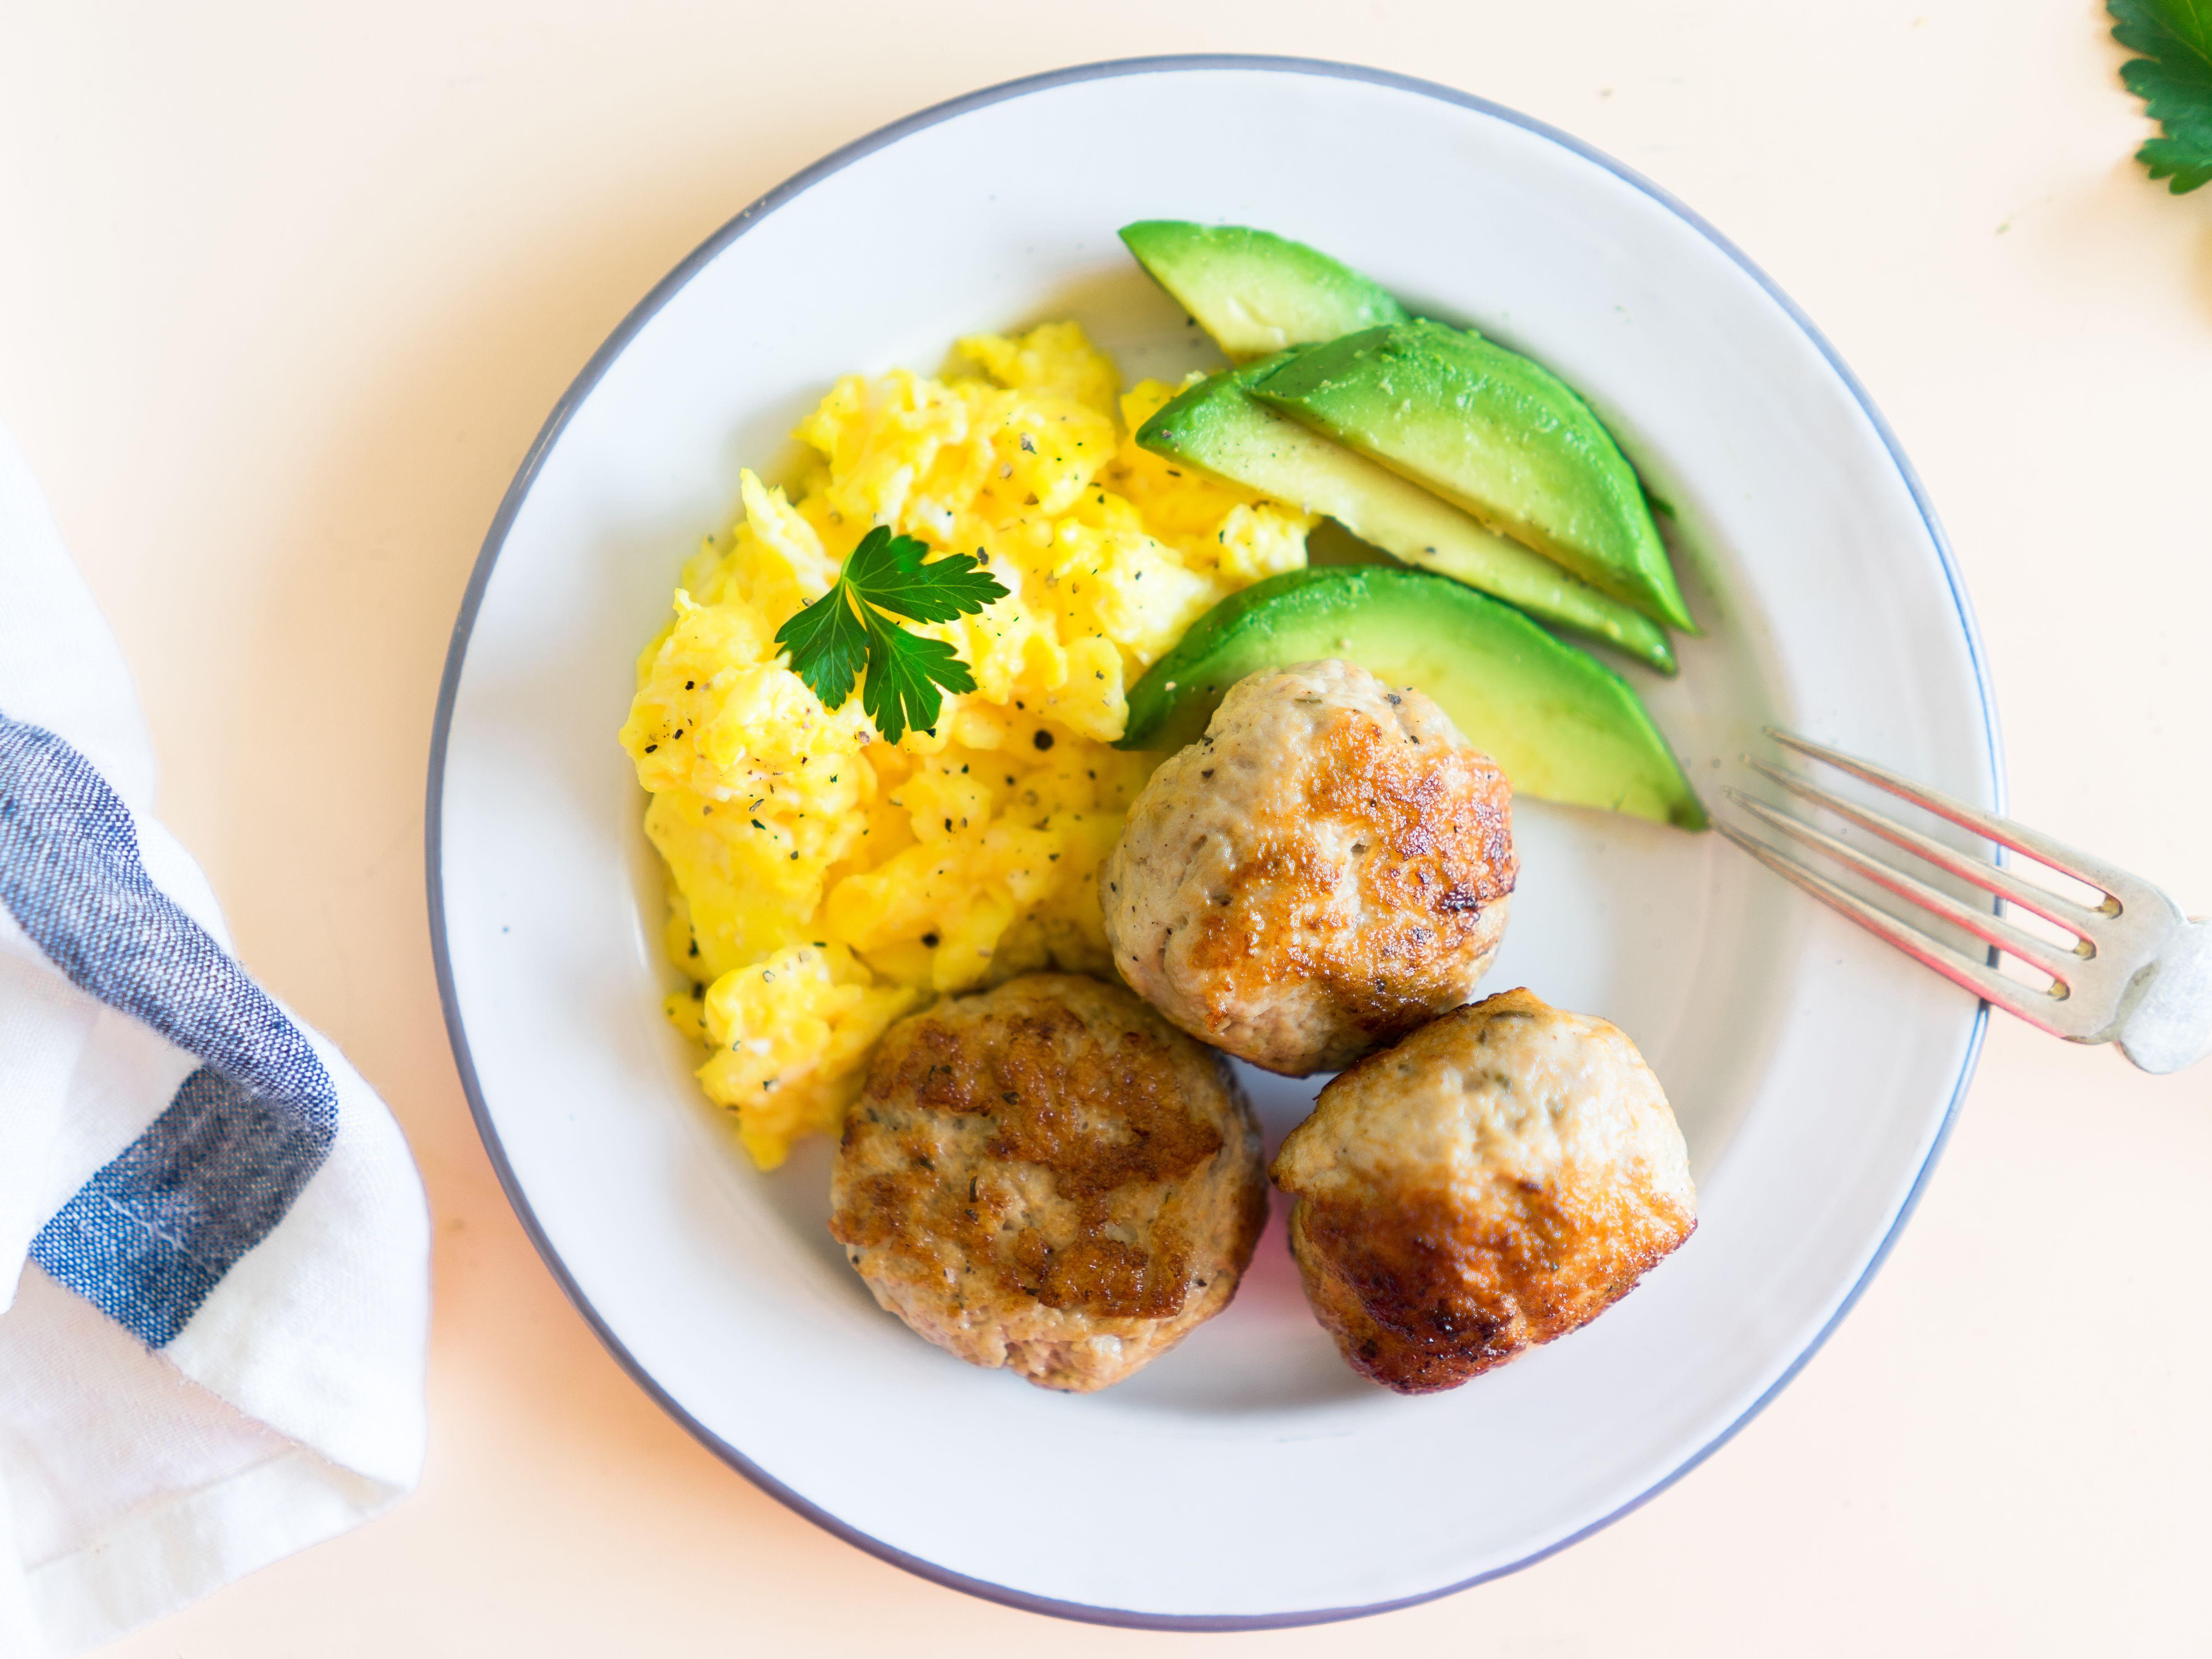 Homemade Pork Breakfast Sausage Recipe